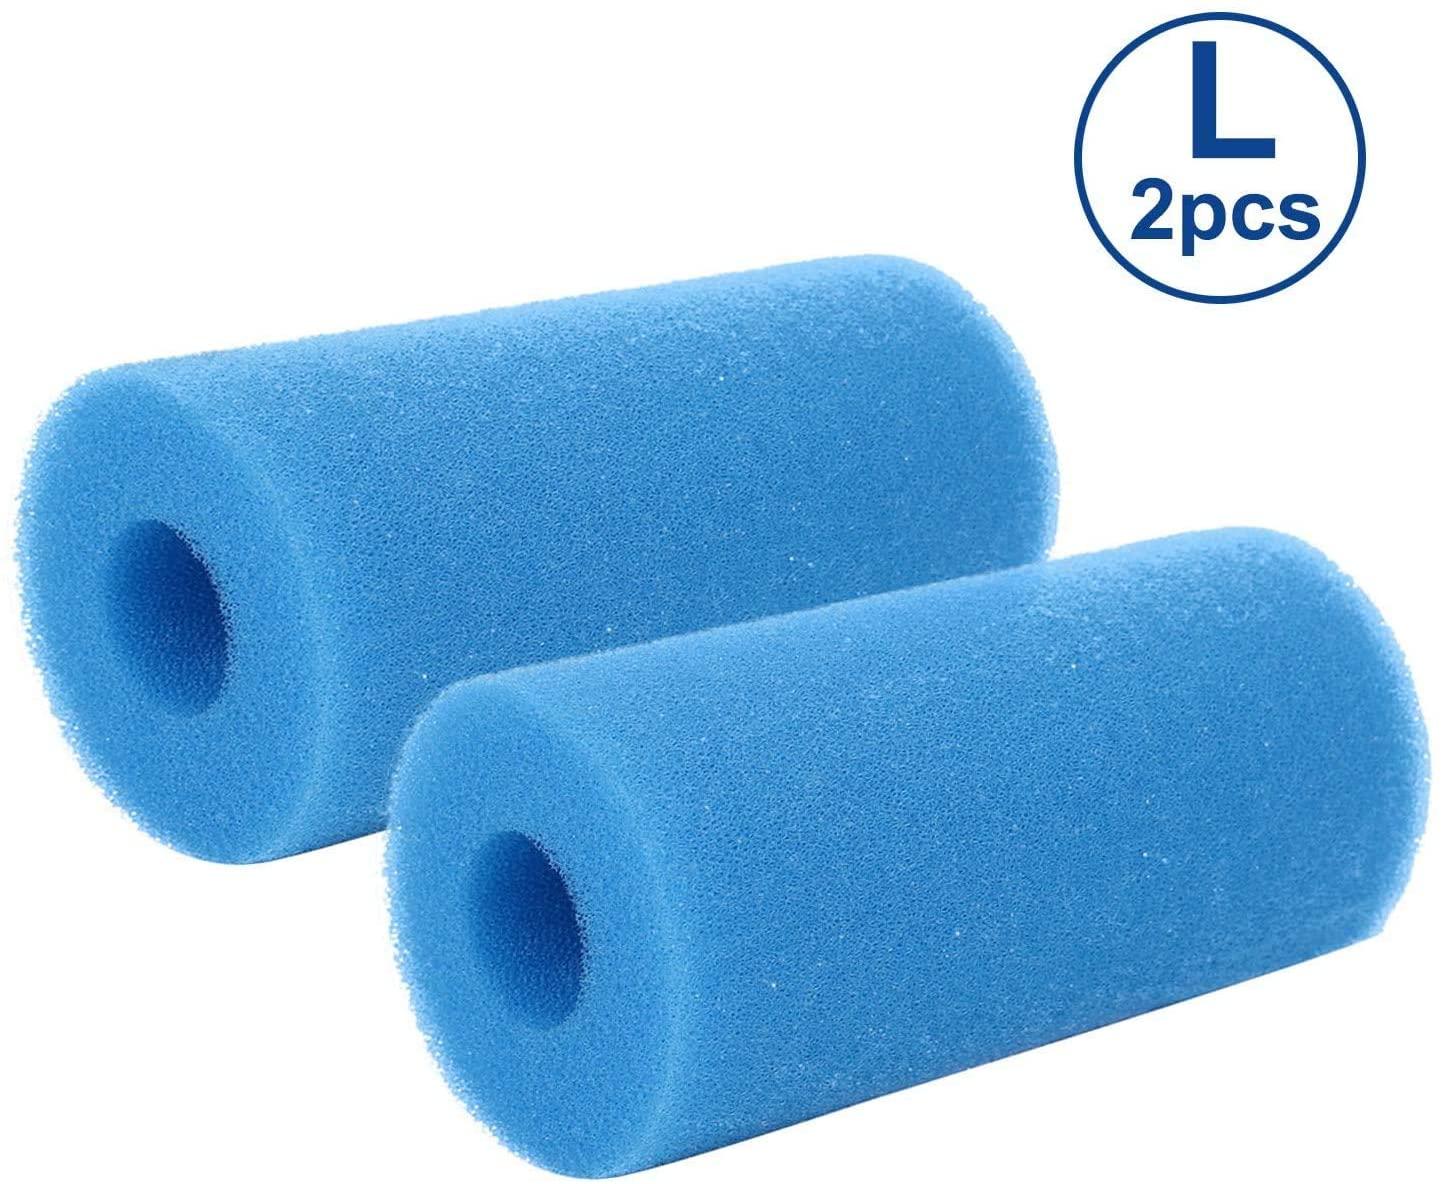 gofidin 2 Pcs Swimming Pool Hot Tub Filter Foam Reusable Filter Cartridge for Intex Type (1.57x3.94x7.87 in)